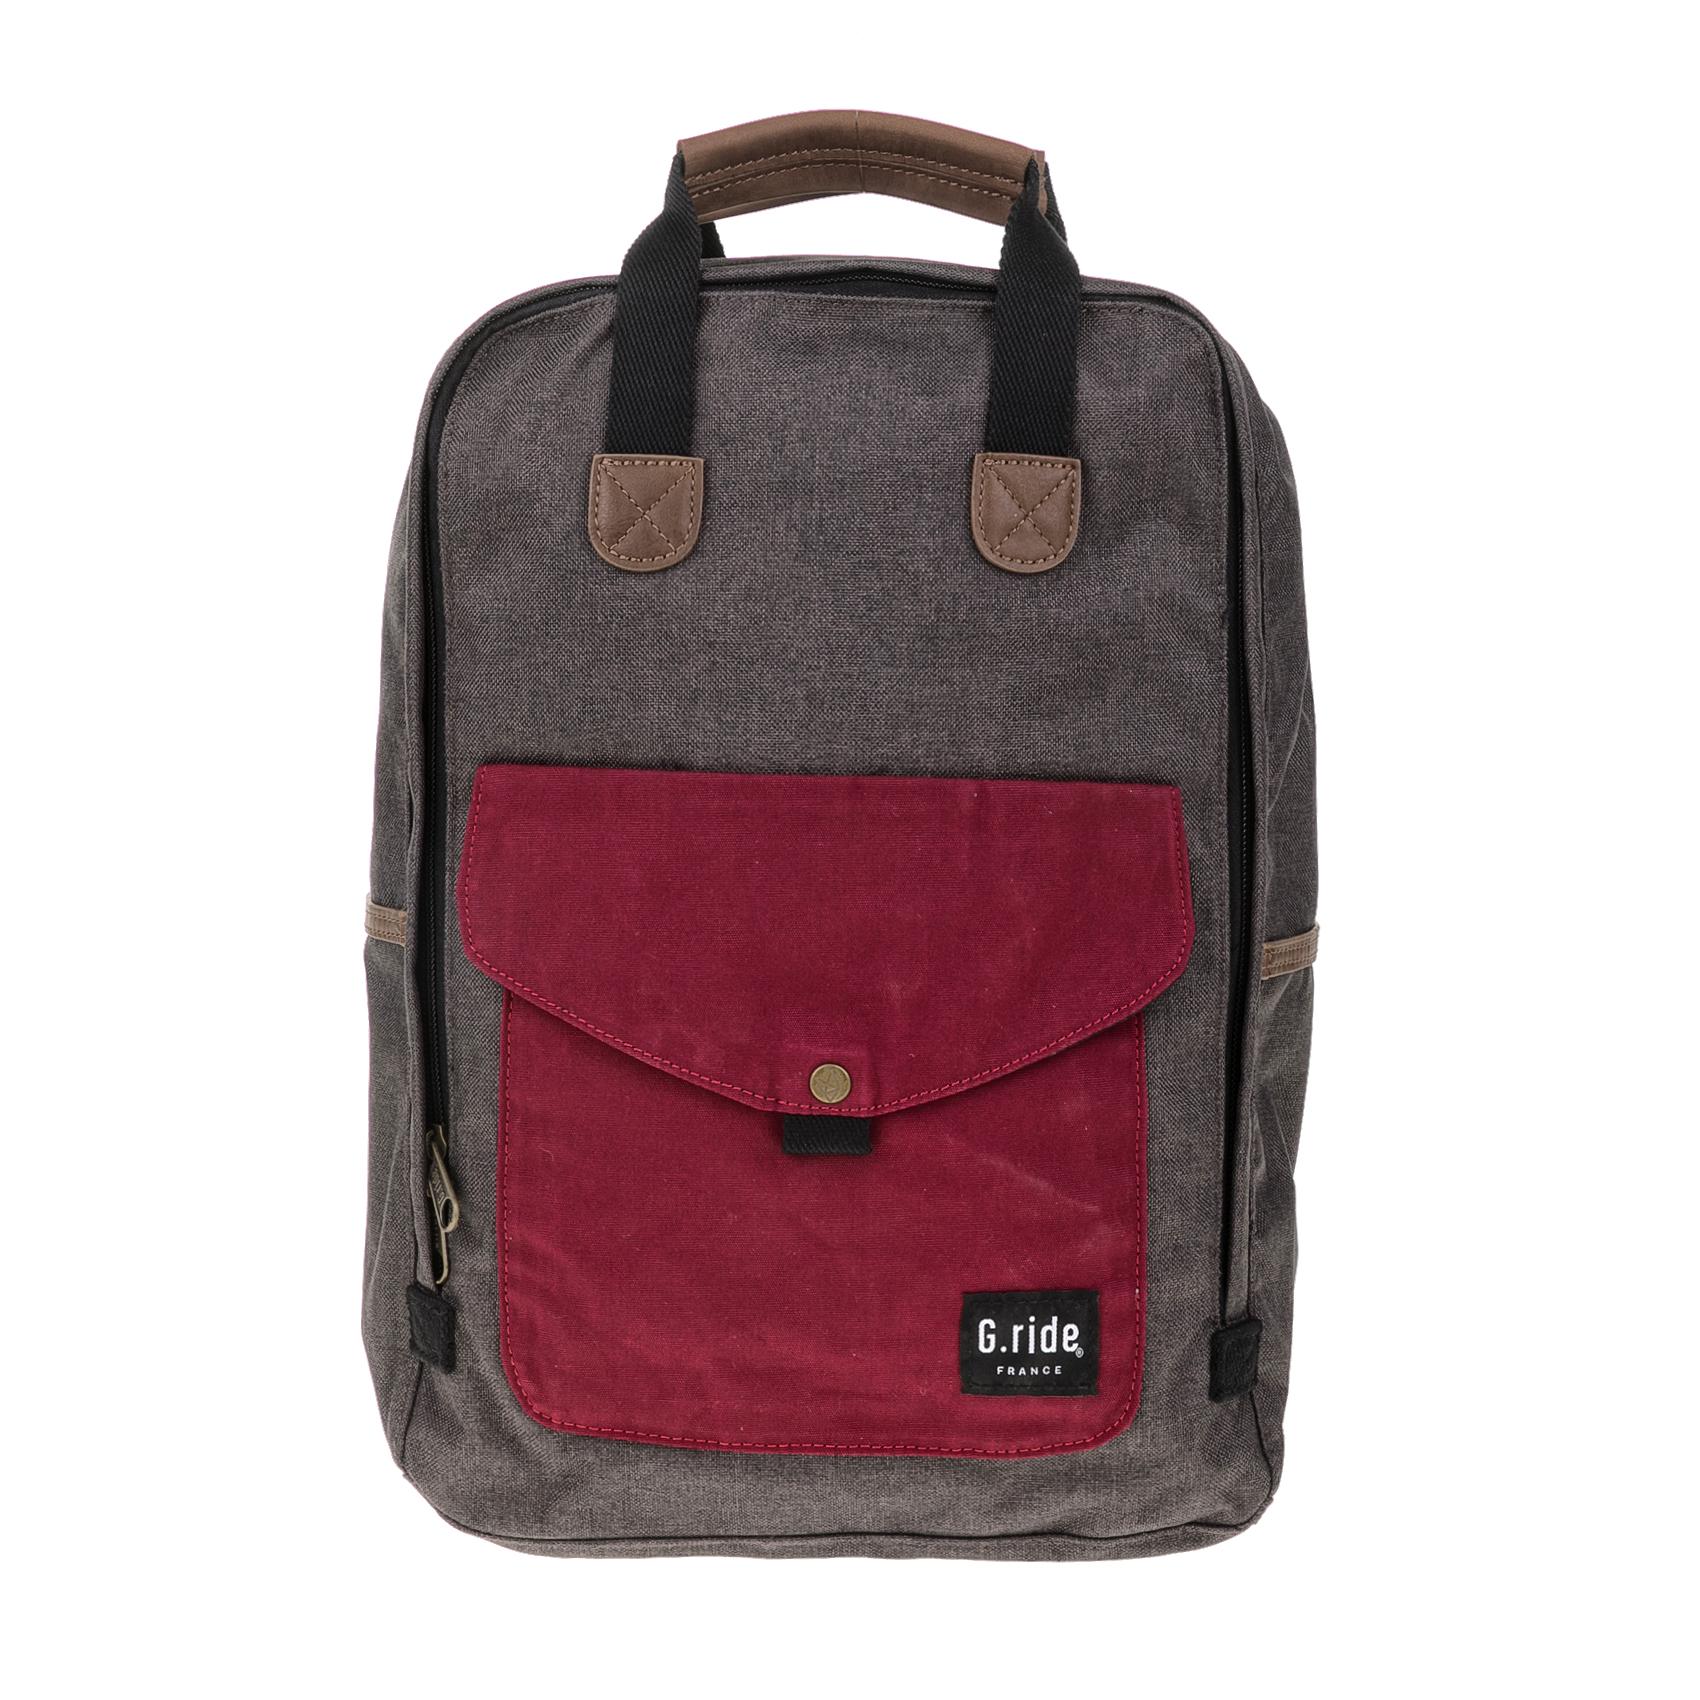 G.RIDE – Τσάντα πλάτης BENEDICTE γκρι-καφέ 1641741.0-K100